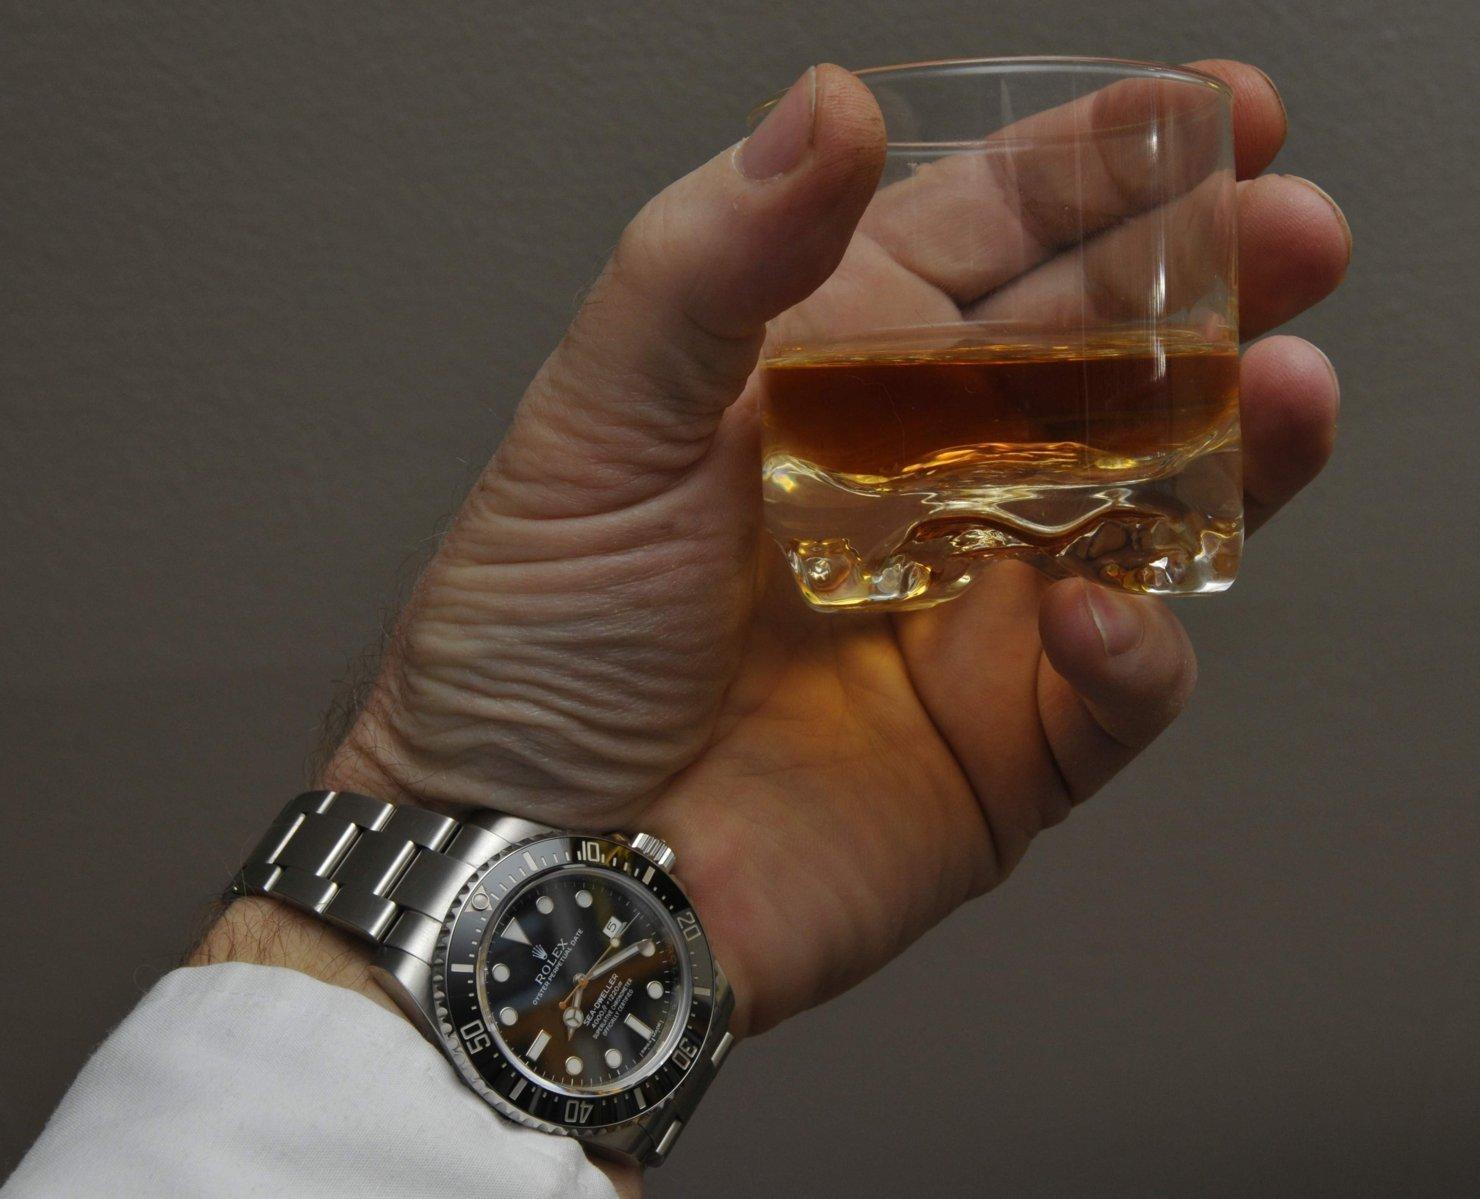 Rolex 2015-03-05 + Whisky.jpg